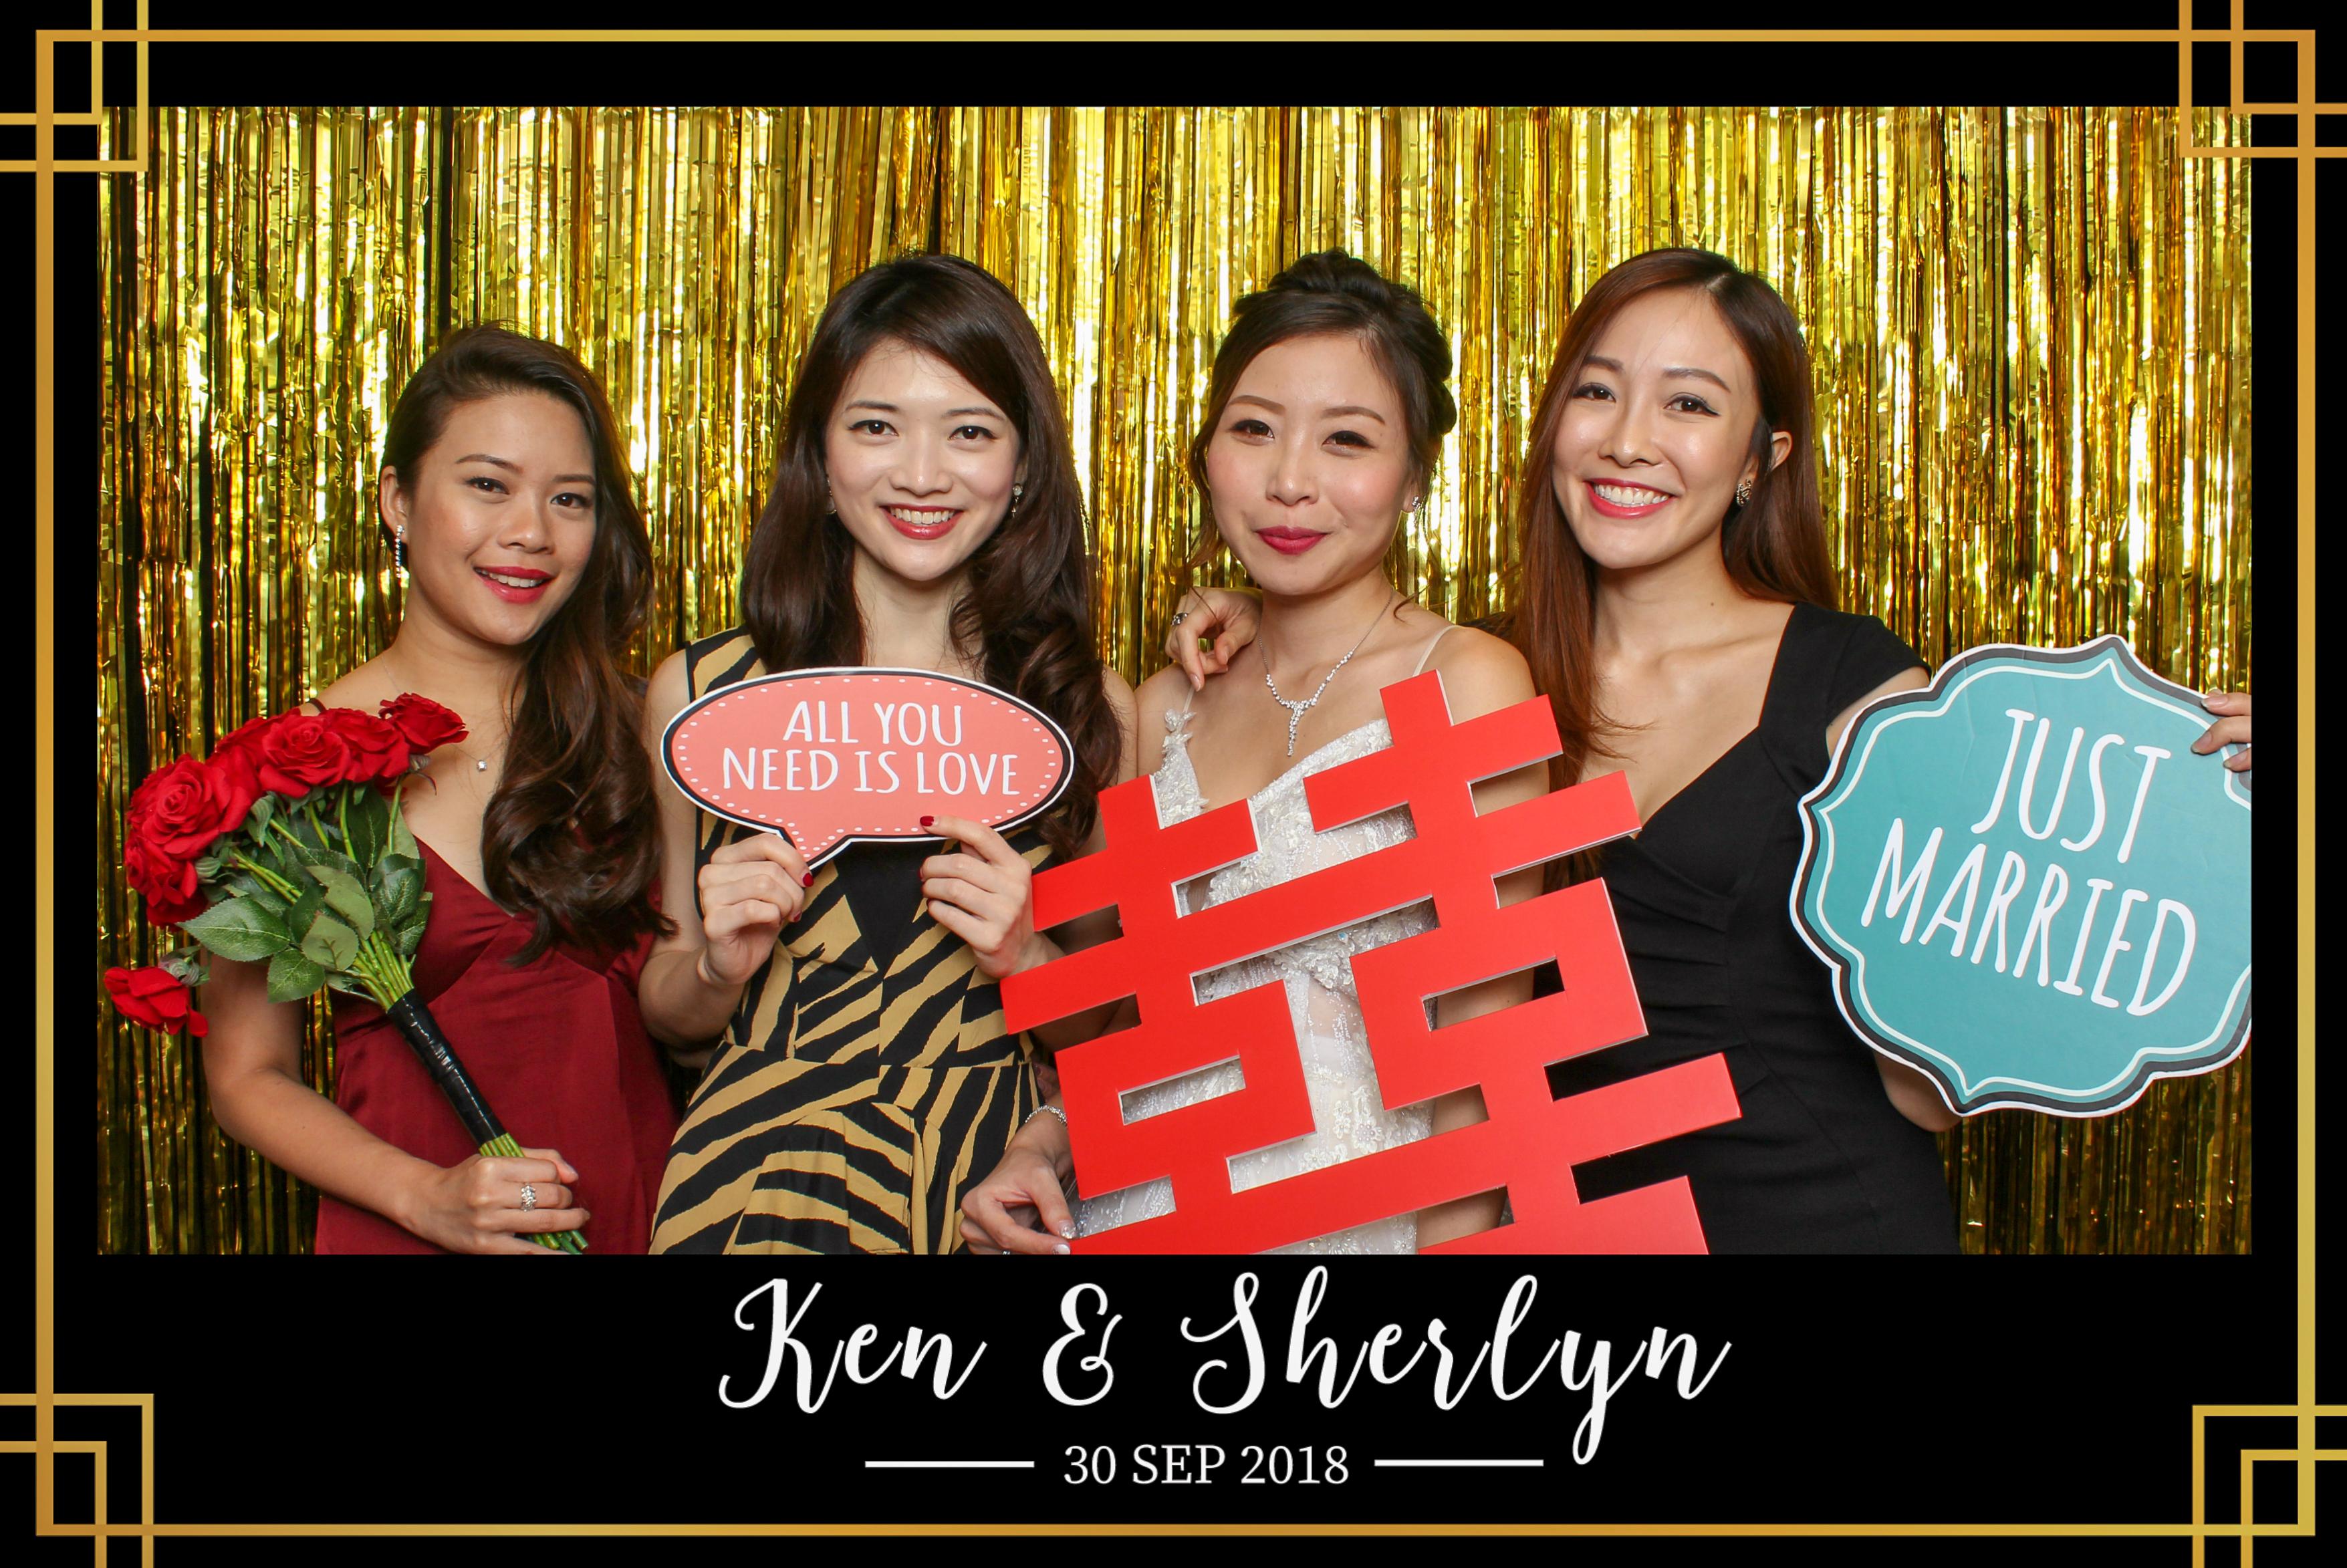 Ken Sherlyn wedding photo booth (10)